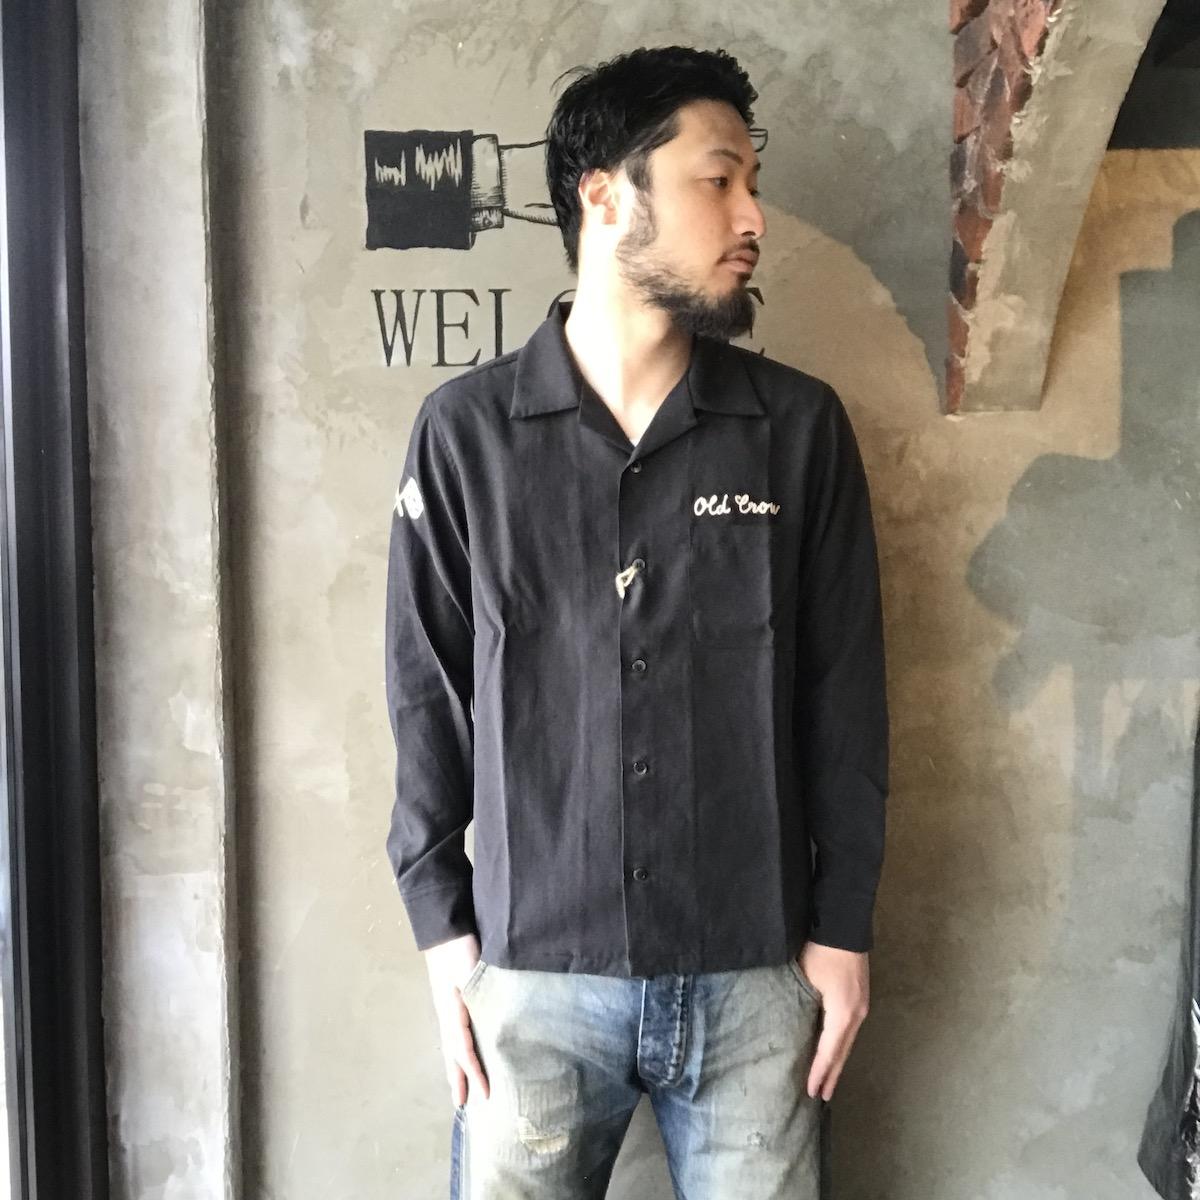 OLD CROW RACING - L/S SHIRTS (BLACK)